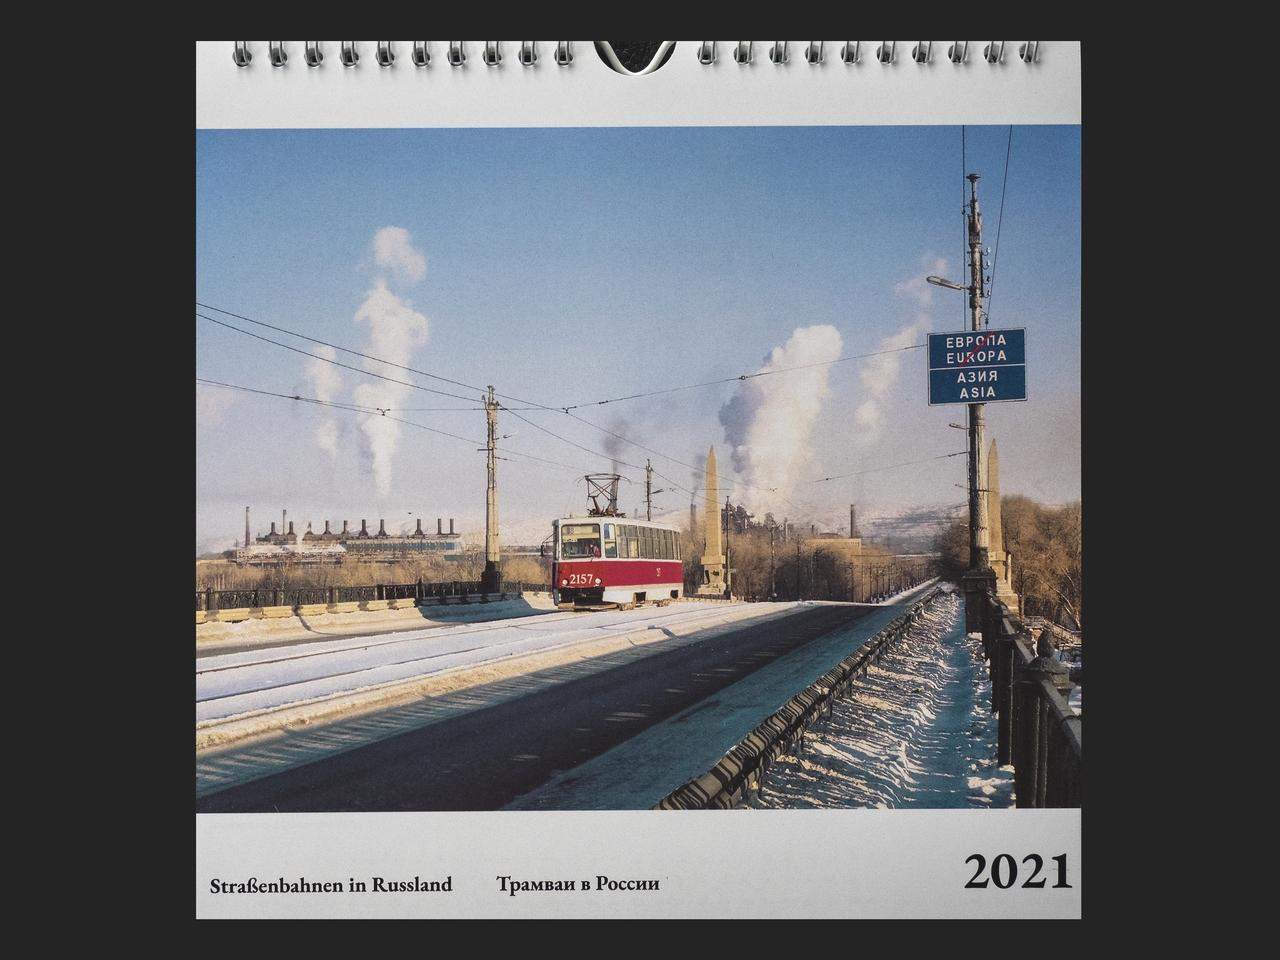 http://ufoportglufenteich.de/wp-content/uploads/2020/10/kalender-promo1-klein.jpg